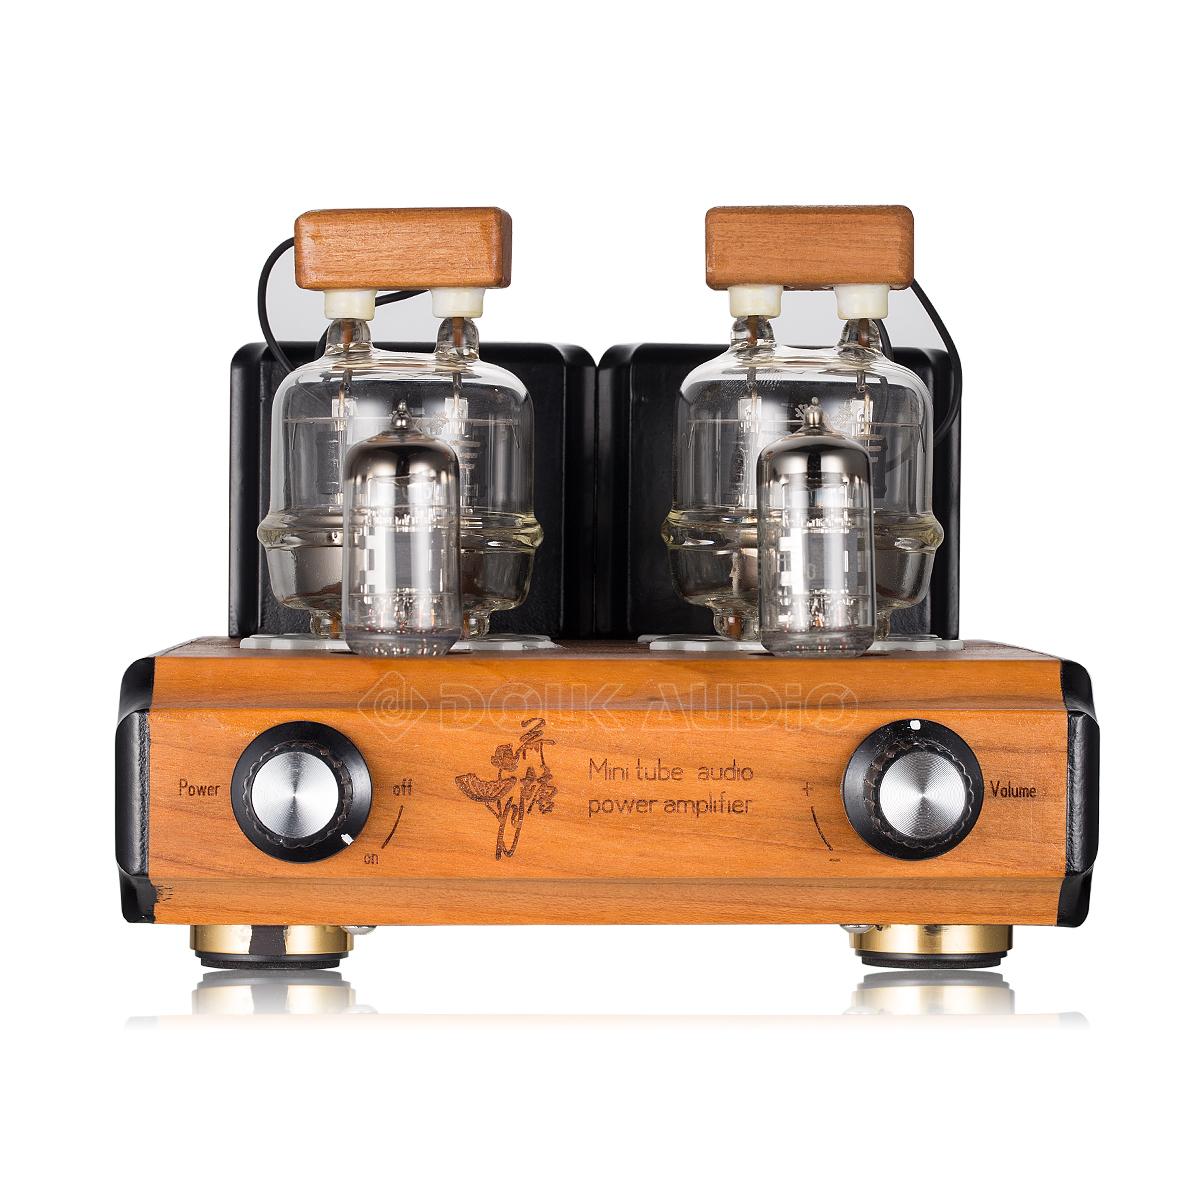 Douk Audio Mini Fu32 Vacuum Tube Amplifier Hifi Push Pull Stereo Power 35w 12ax7 Amp